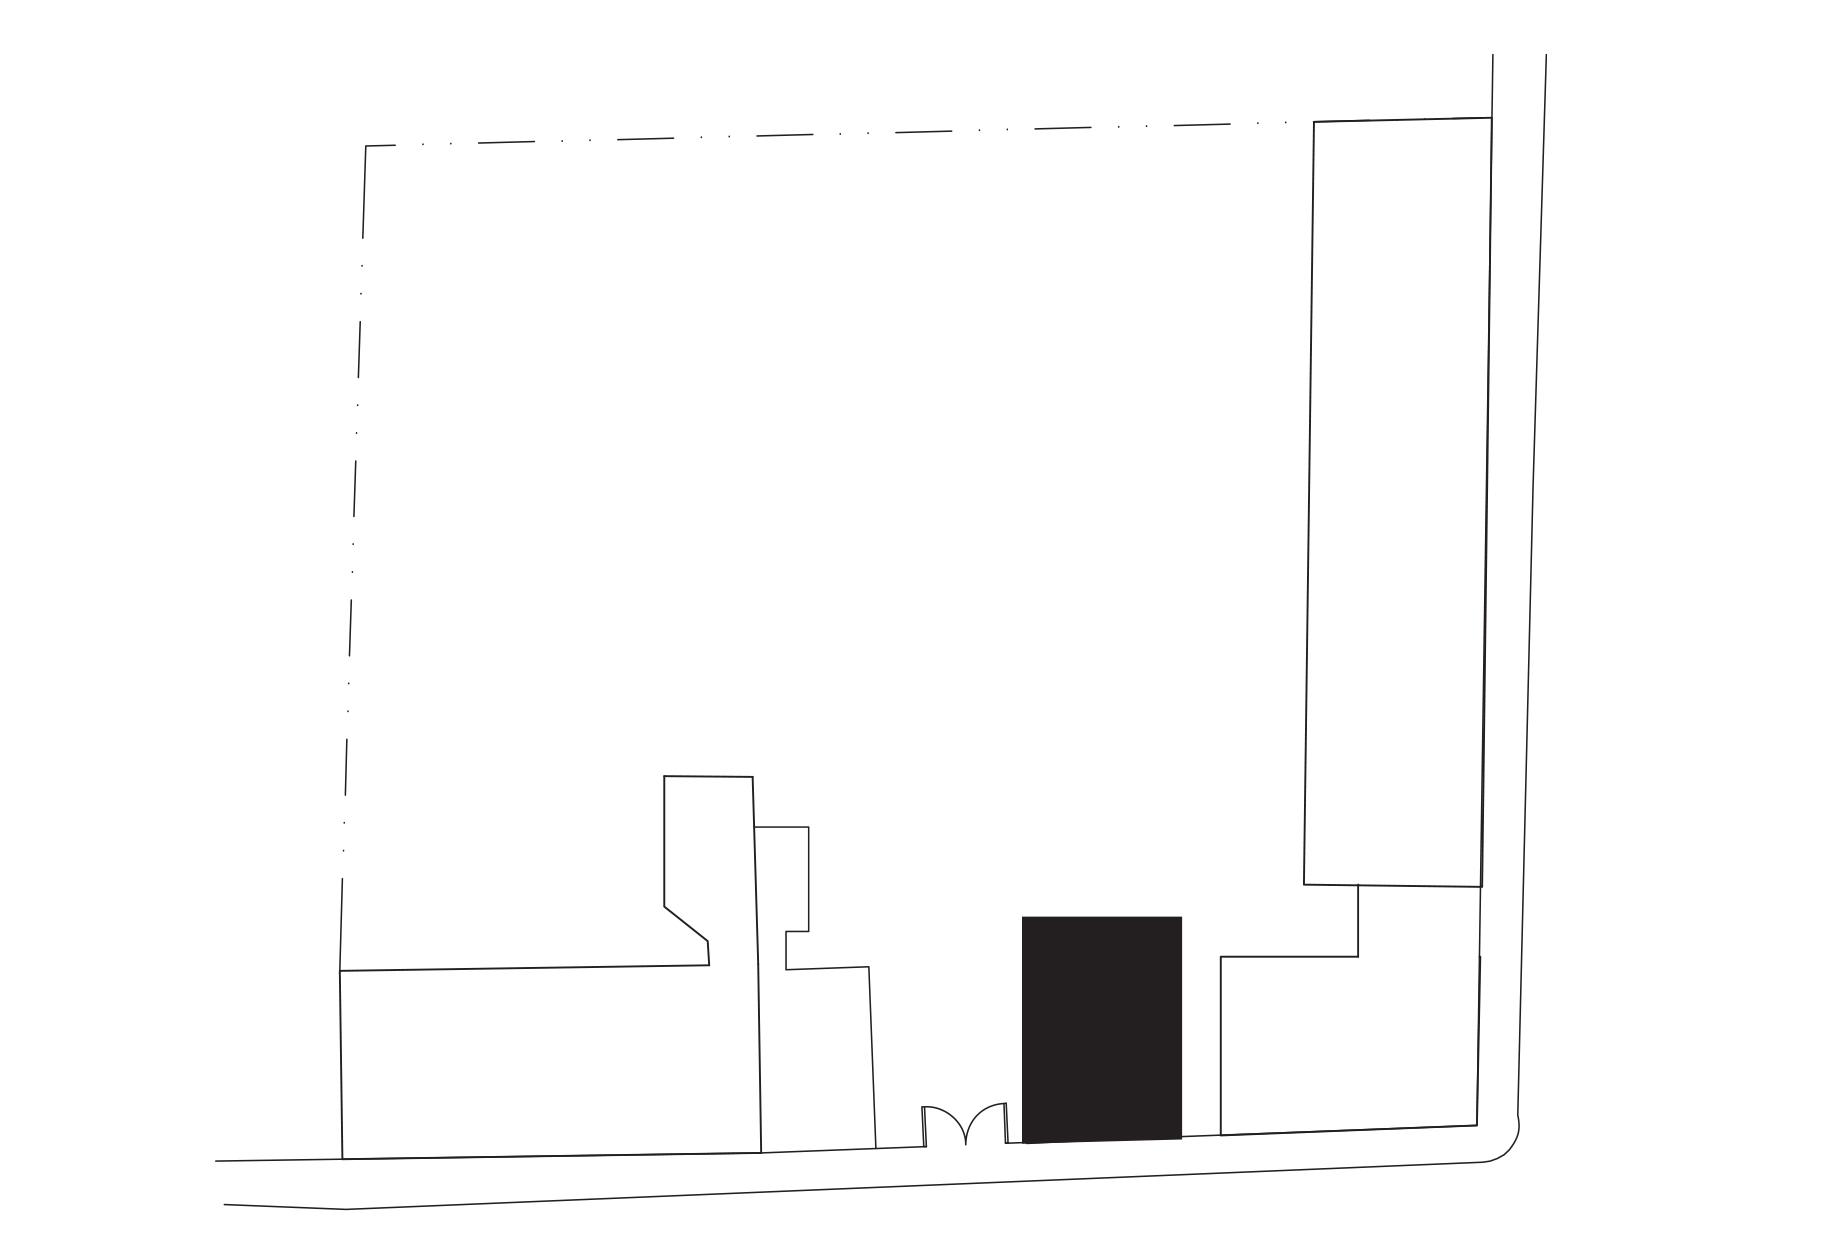 Jerngaarden Cohousing  in Aarhus, DK. Designed by Ole Pederson og Finn Norholm